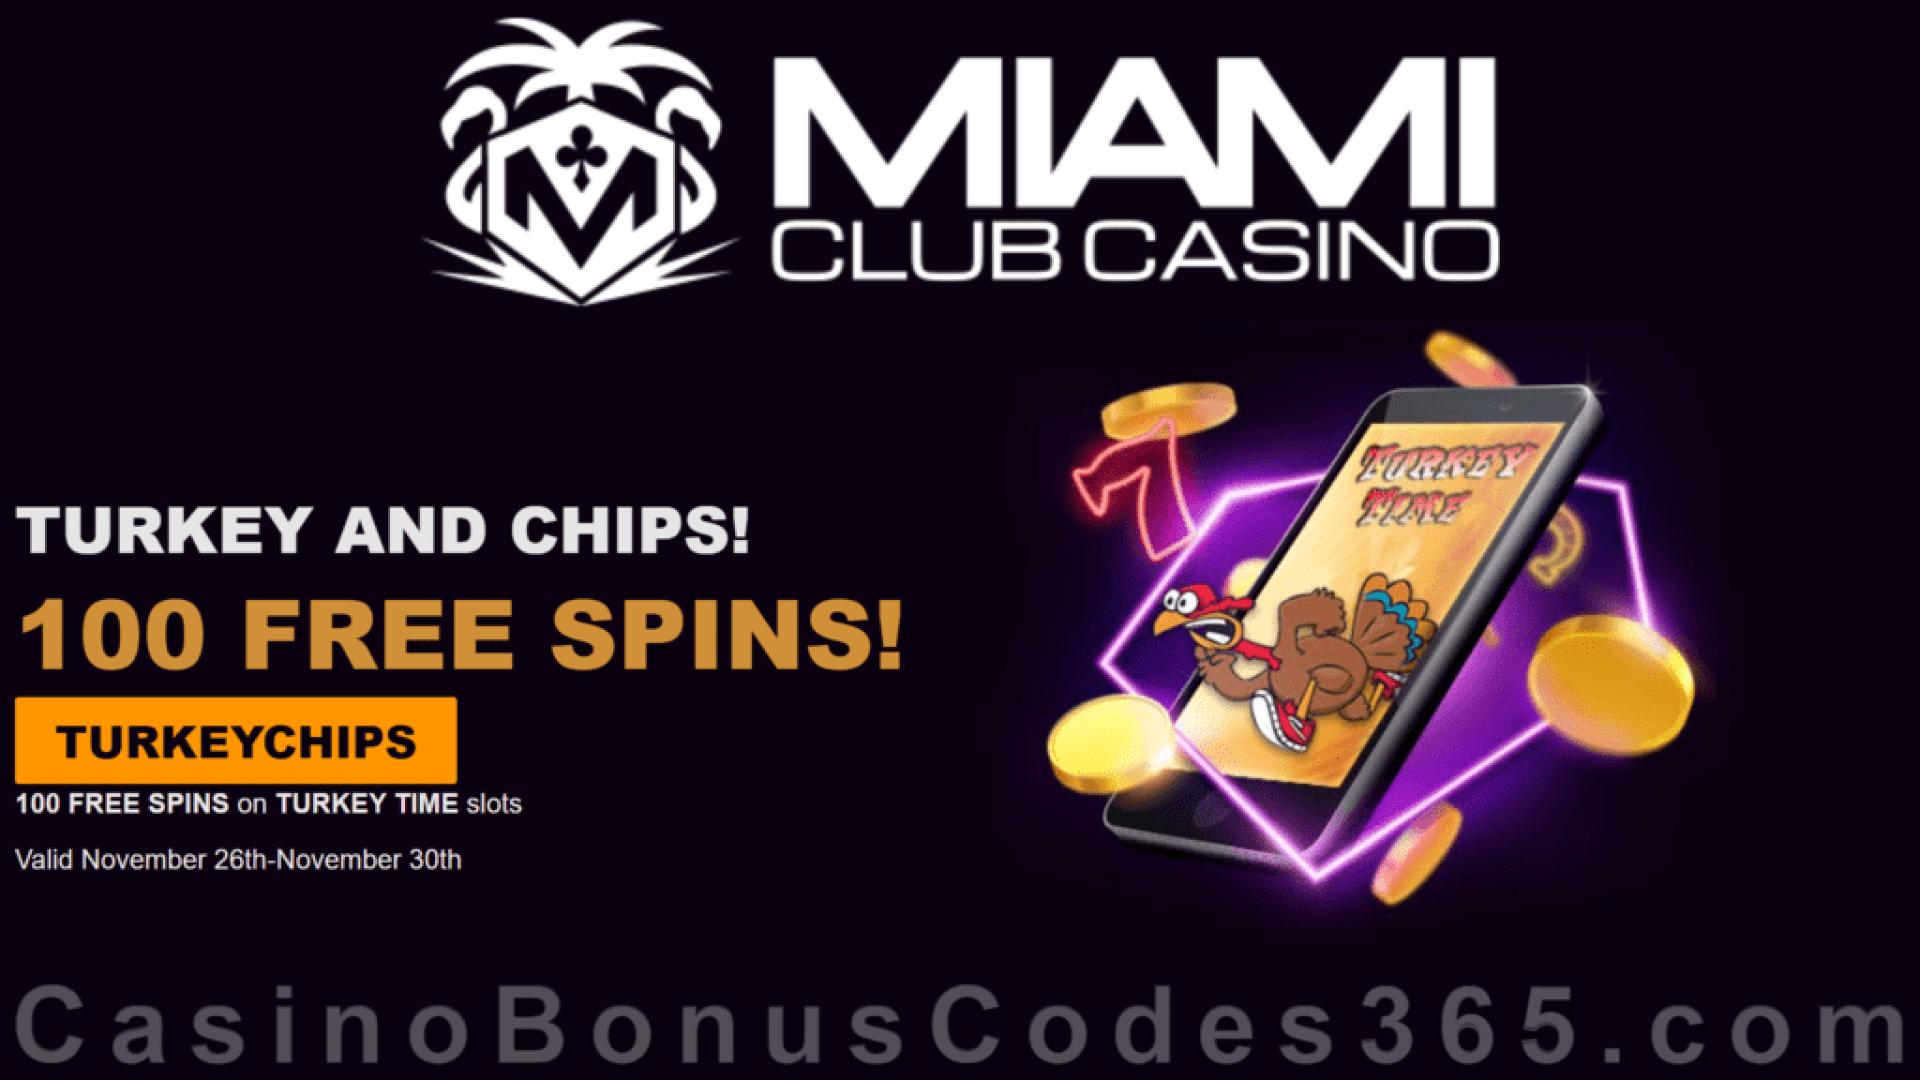 Miami Club Casino 100 FREE Spins on WGS Turkey Time Mega Thanksgiving Deal